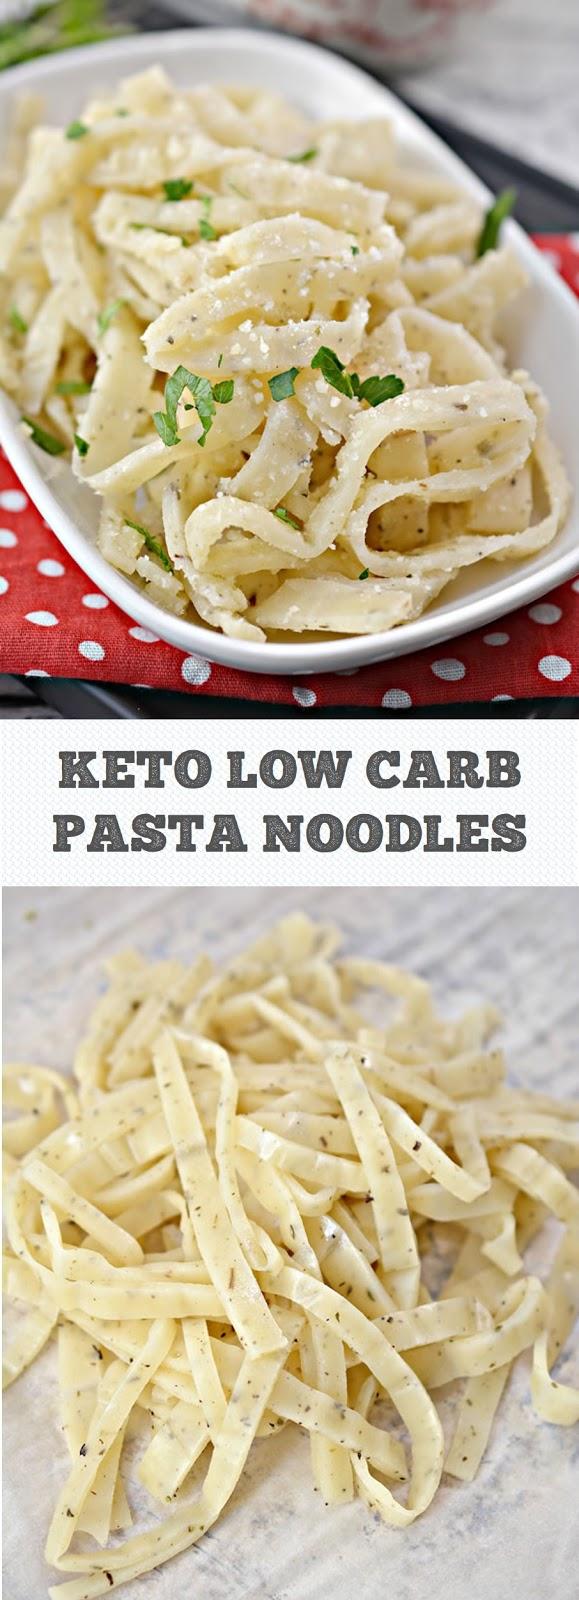 keto low carb pasta noodles ketogenic ketopasta  low